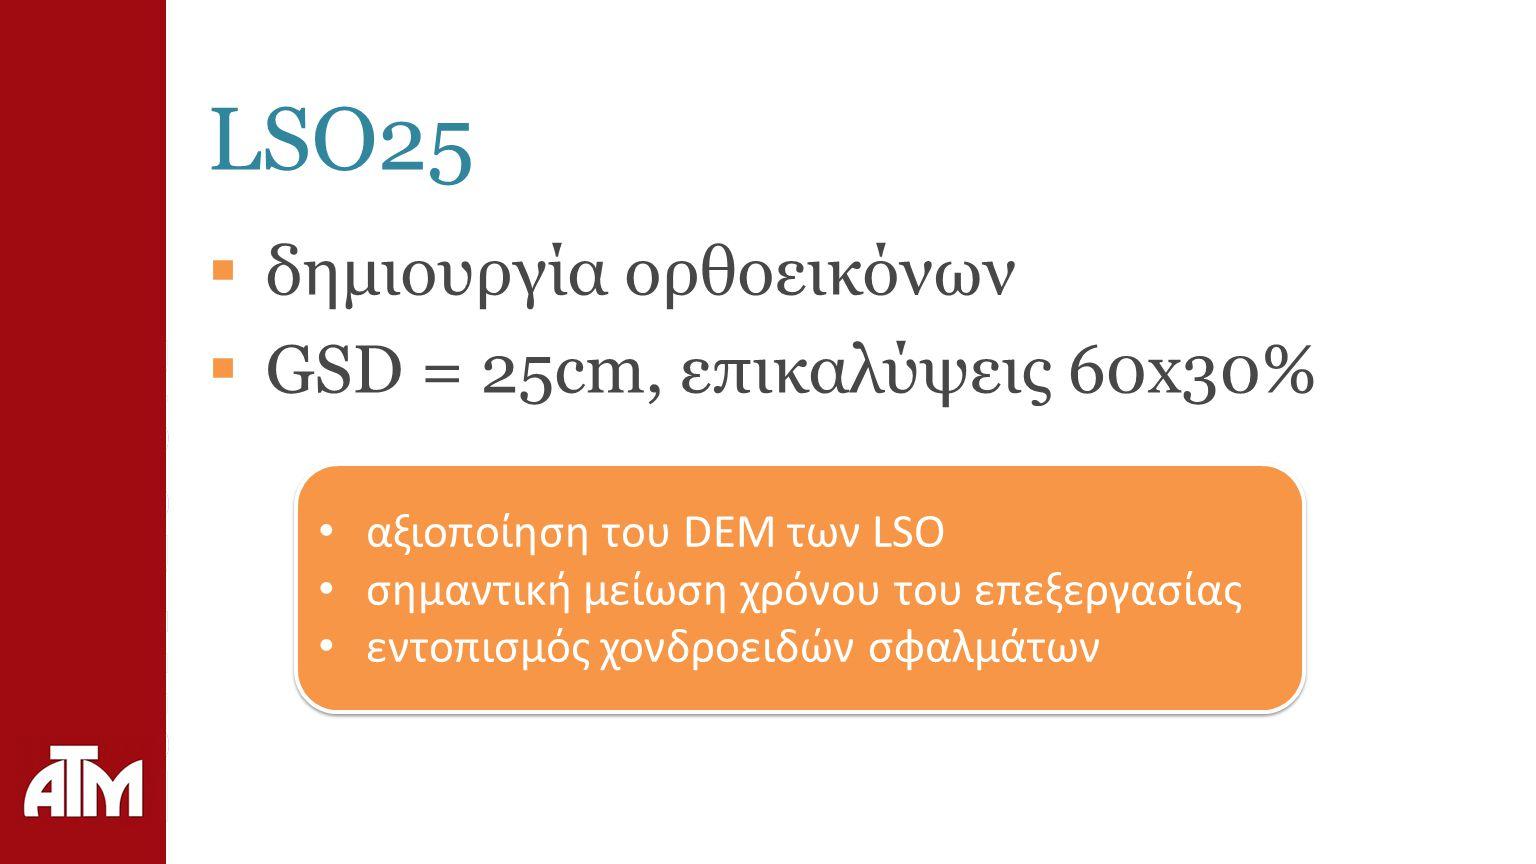 LSO25  δημιουργία ορθοεικόνων  GSD = 25cm, επικαλύψεις 60x30% αξιοποίηση του DEM των LSO σημαντική μείωση χρόνου του επεξεργασίας εντοπισμός χονδροειδών σφαλμάτων αξιοποίηση του DEM των LSO σημαντική μείωση χρόνου του επεξεργασίας εντοπισμός χονδροειδών σφαλμάτων